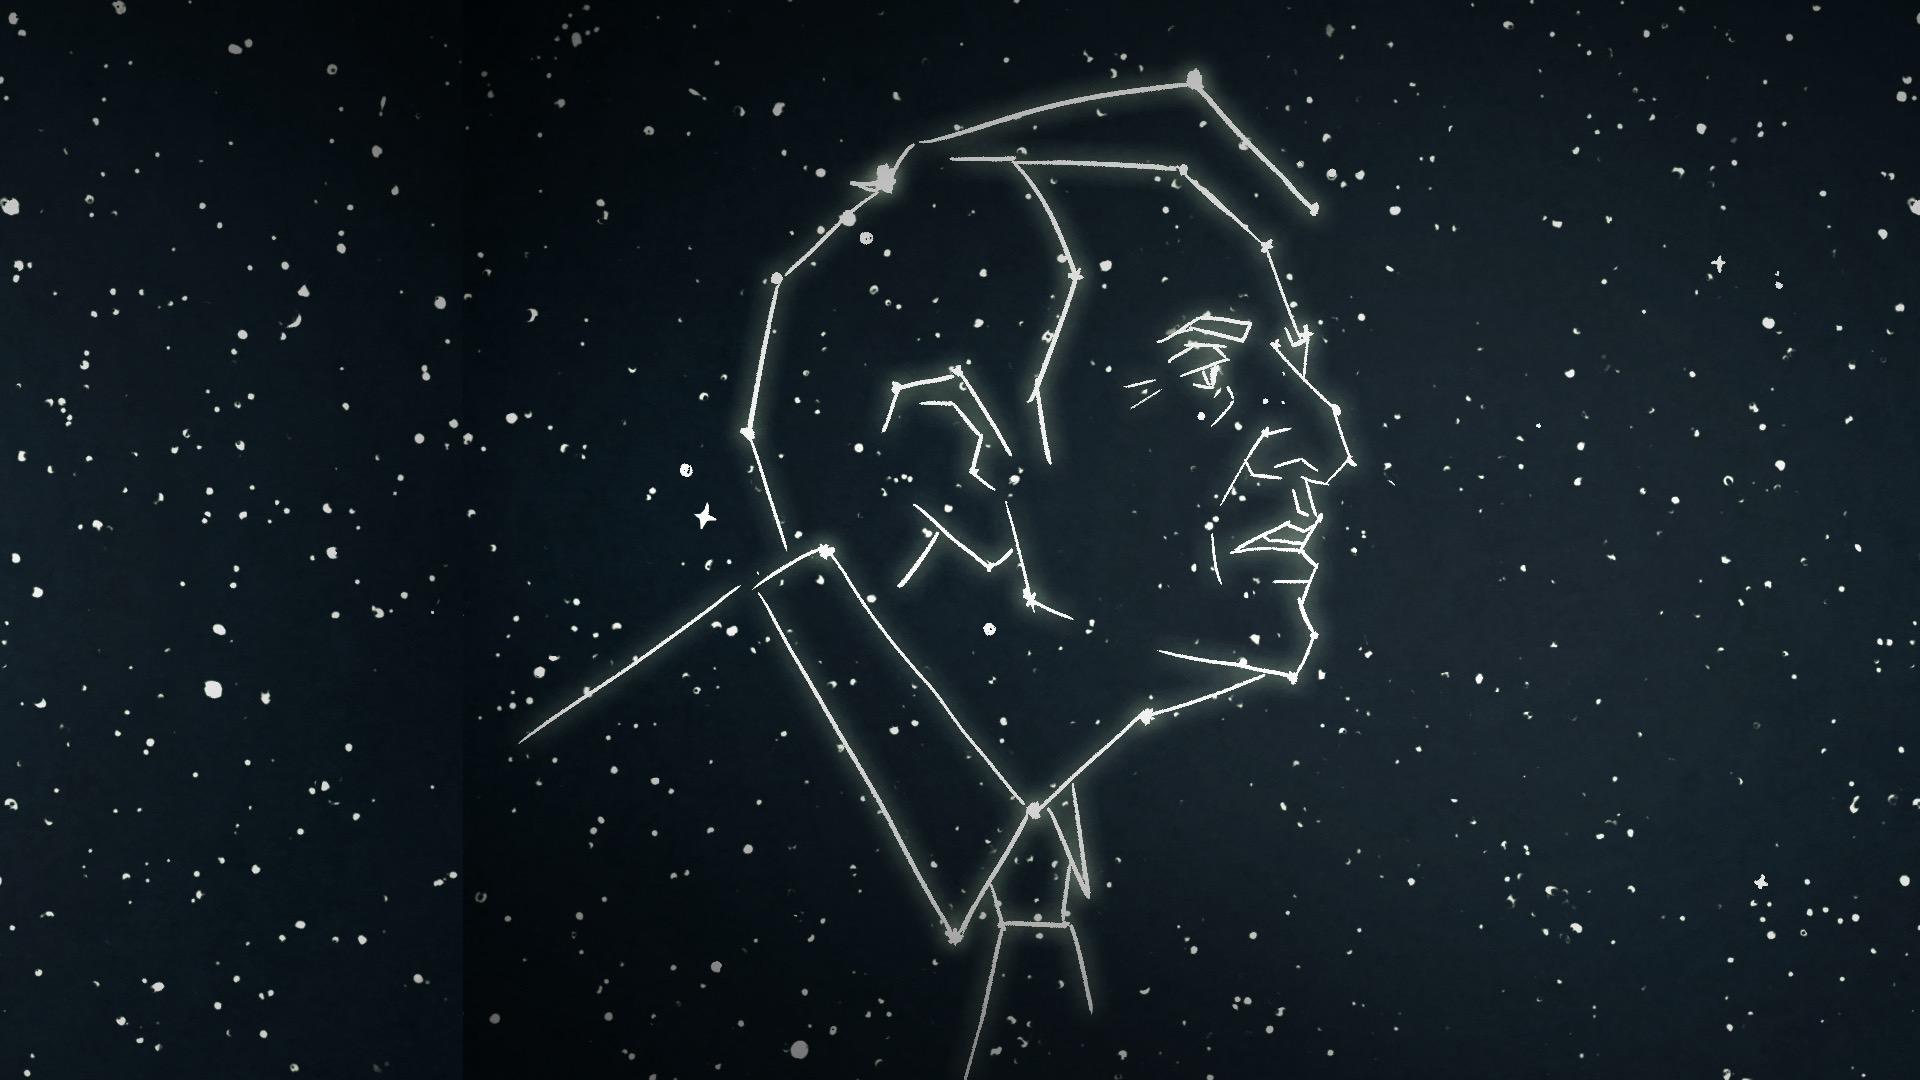 Instagram Wallpaper Quotes Carl Sagan On Extraterrestrials Blank On Blank